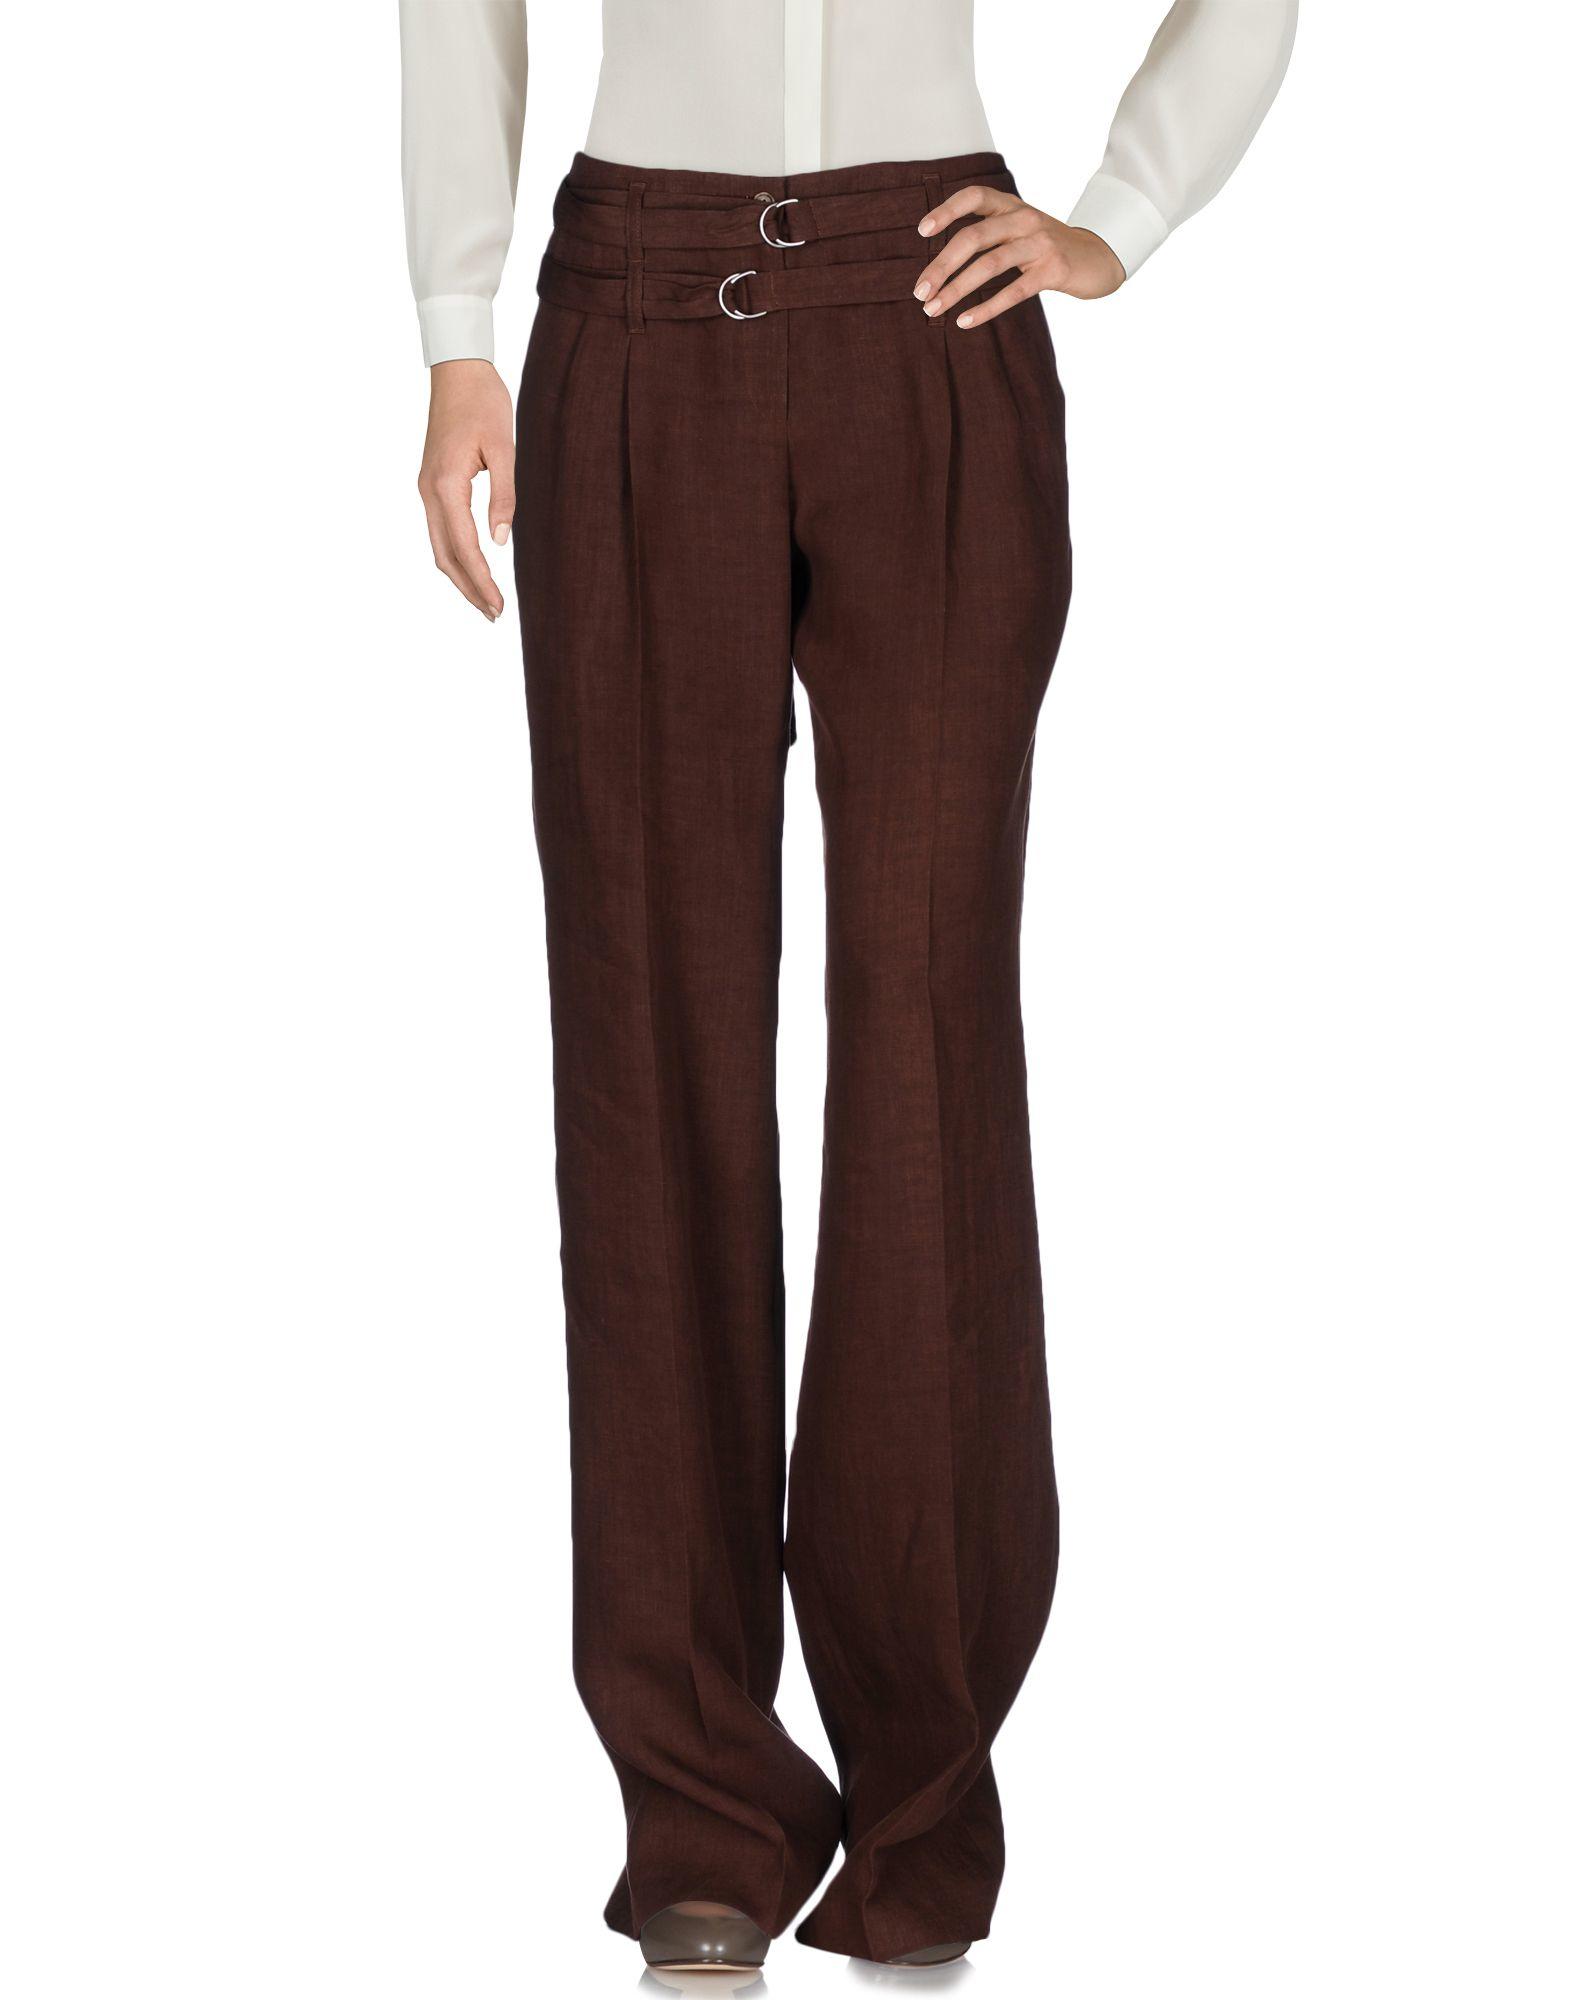 michael kors casual trouser in blue brown lyst